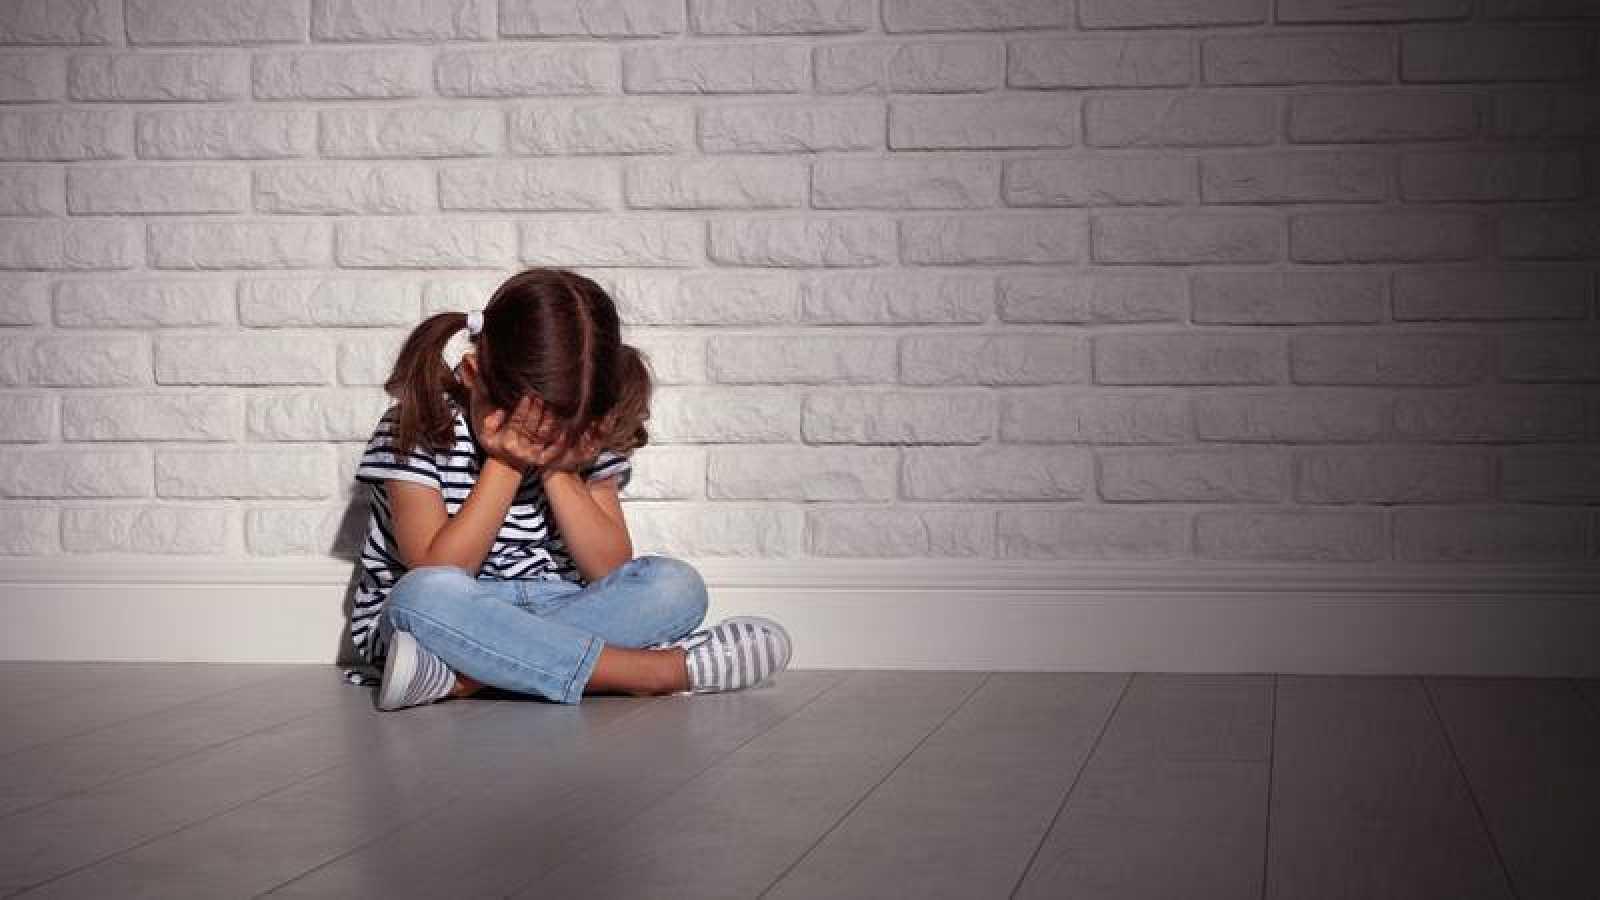 Imagen recurso de maltrato infantil